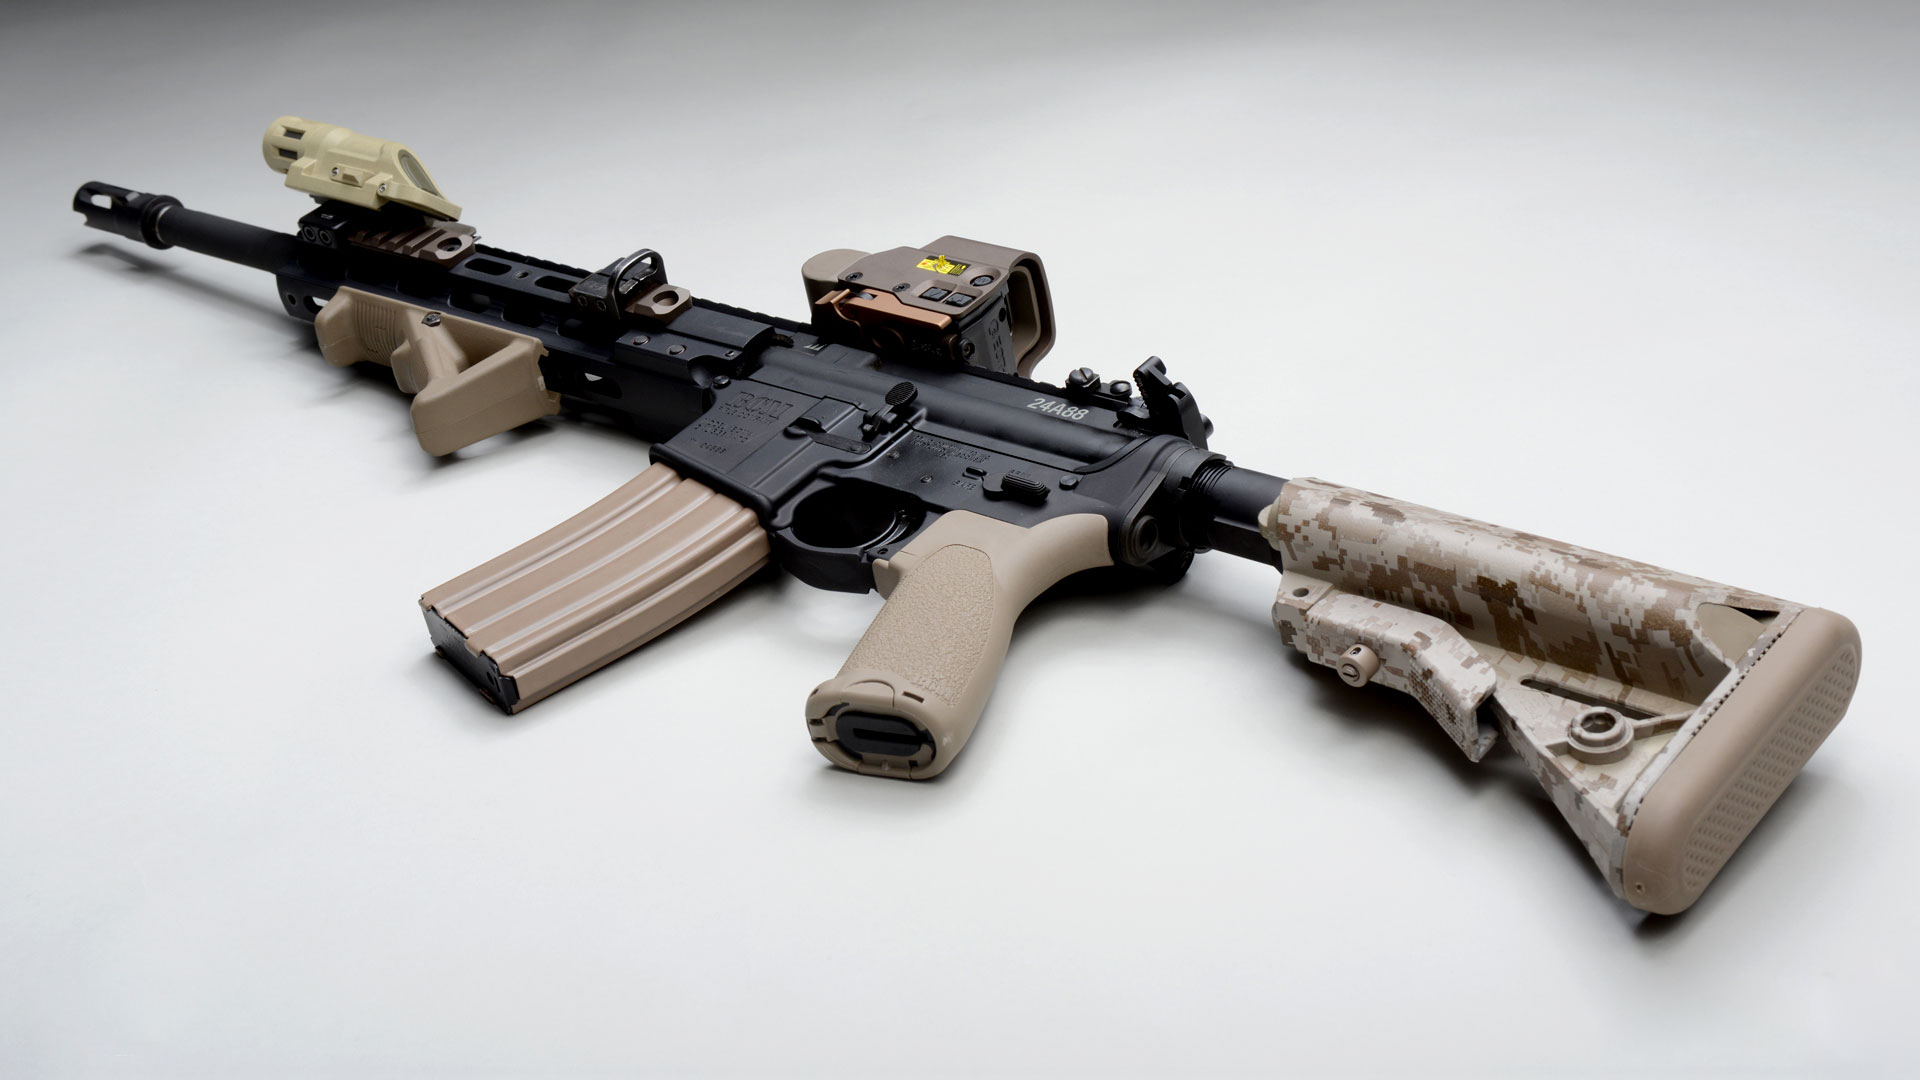 Automatic Ar 15 Assault Rifle Weapon Gun Military Wallpaper